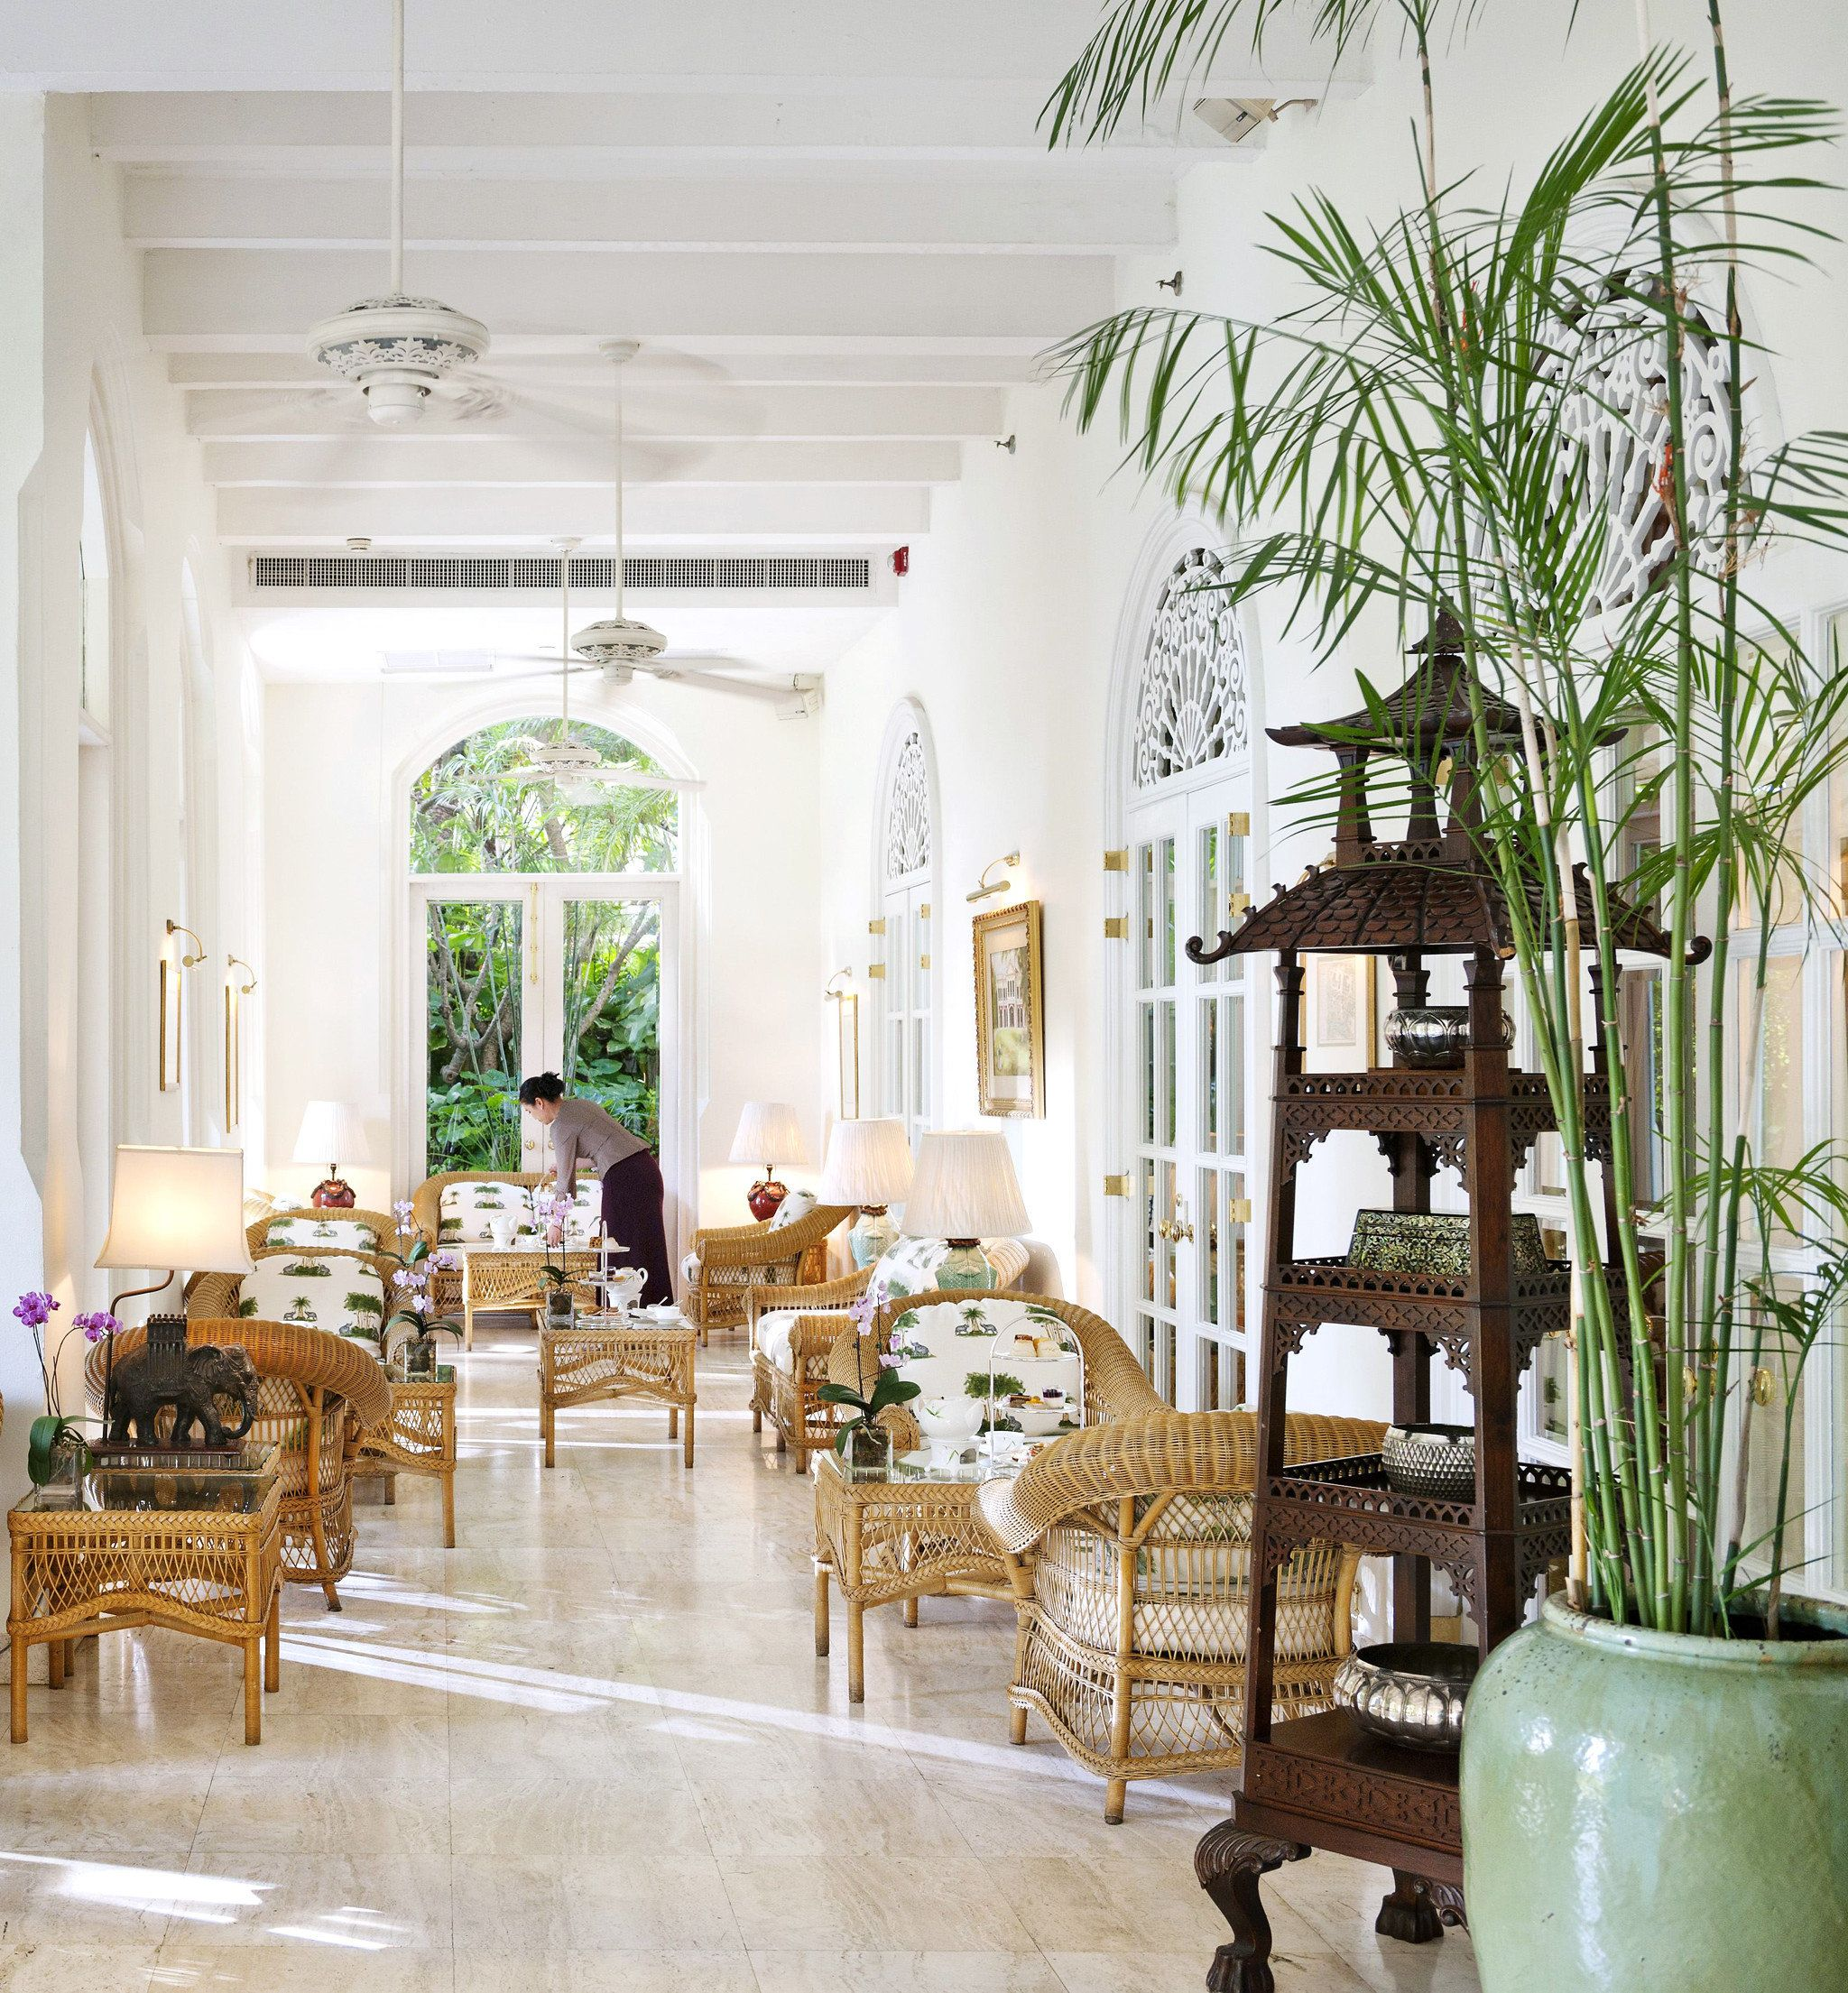 Living Hall Interior Design: Hall Interior Design, Elegant